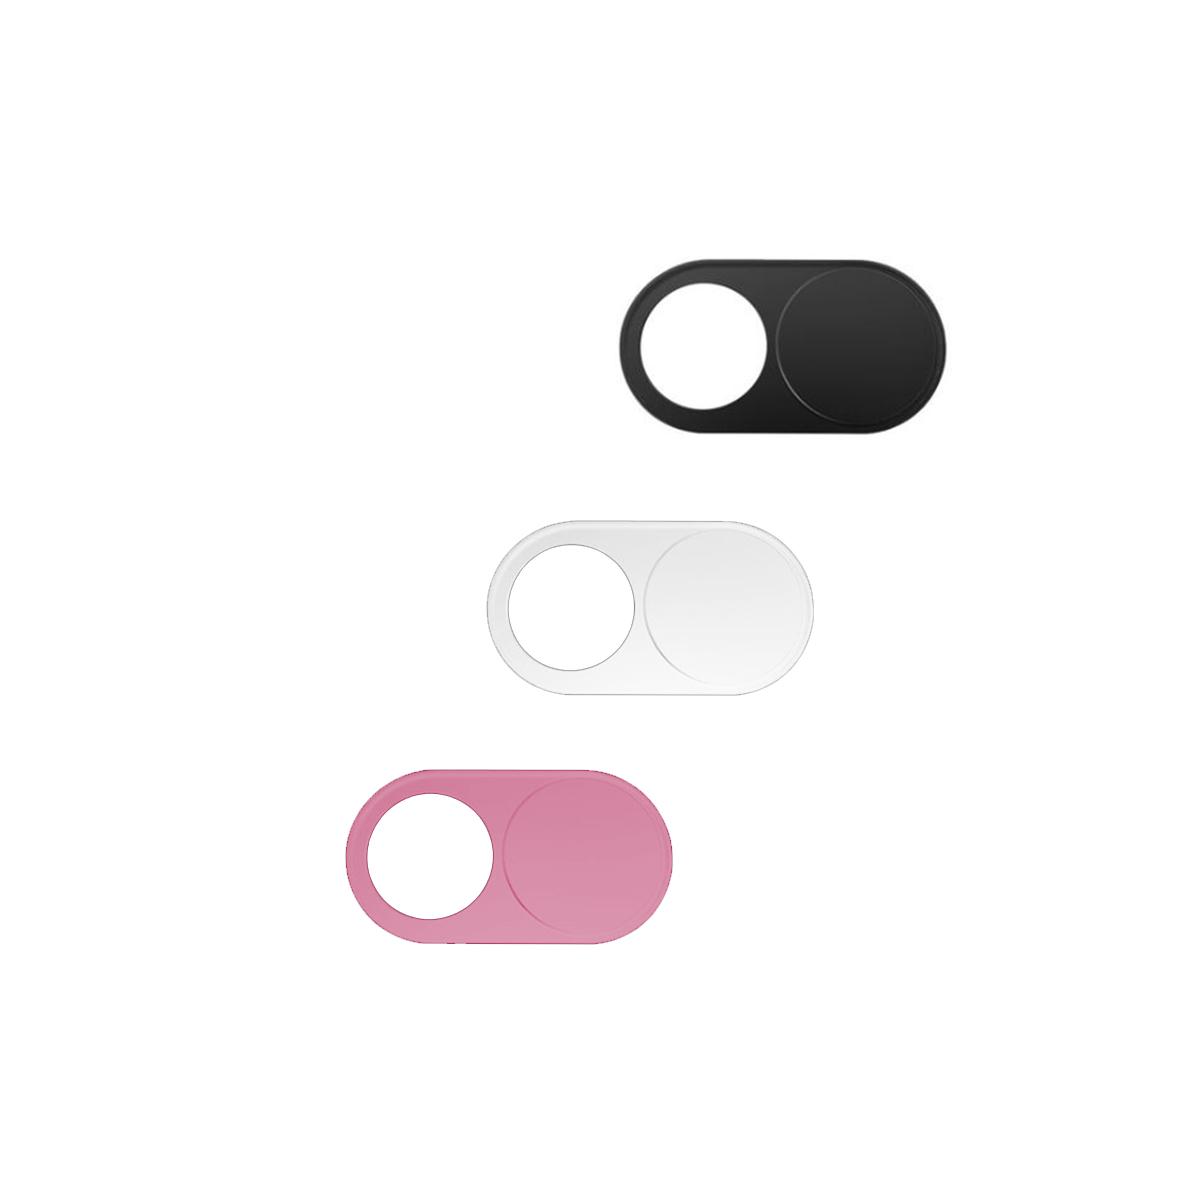 IAG-Cellphone-Webcam-Privacy-Protector-Hero-1200×1200